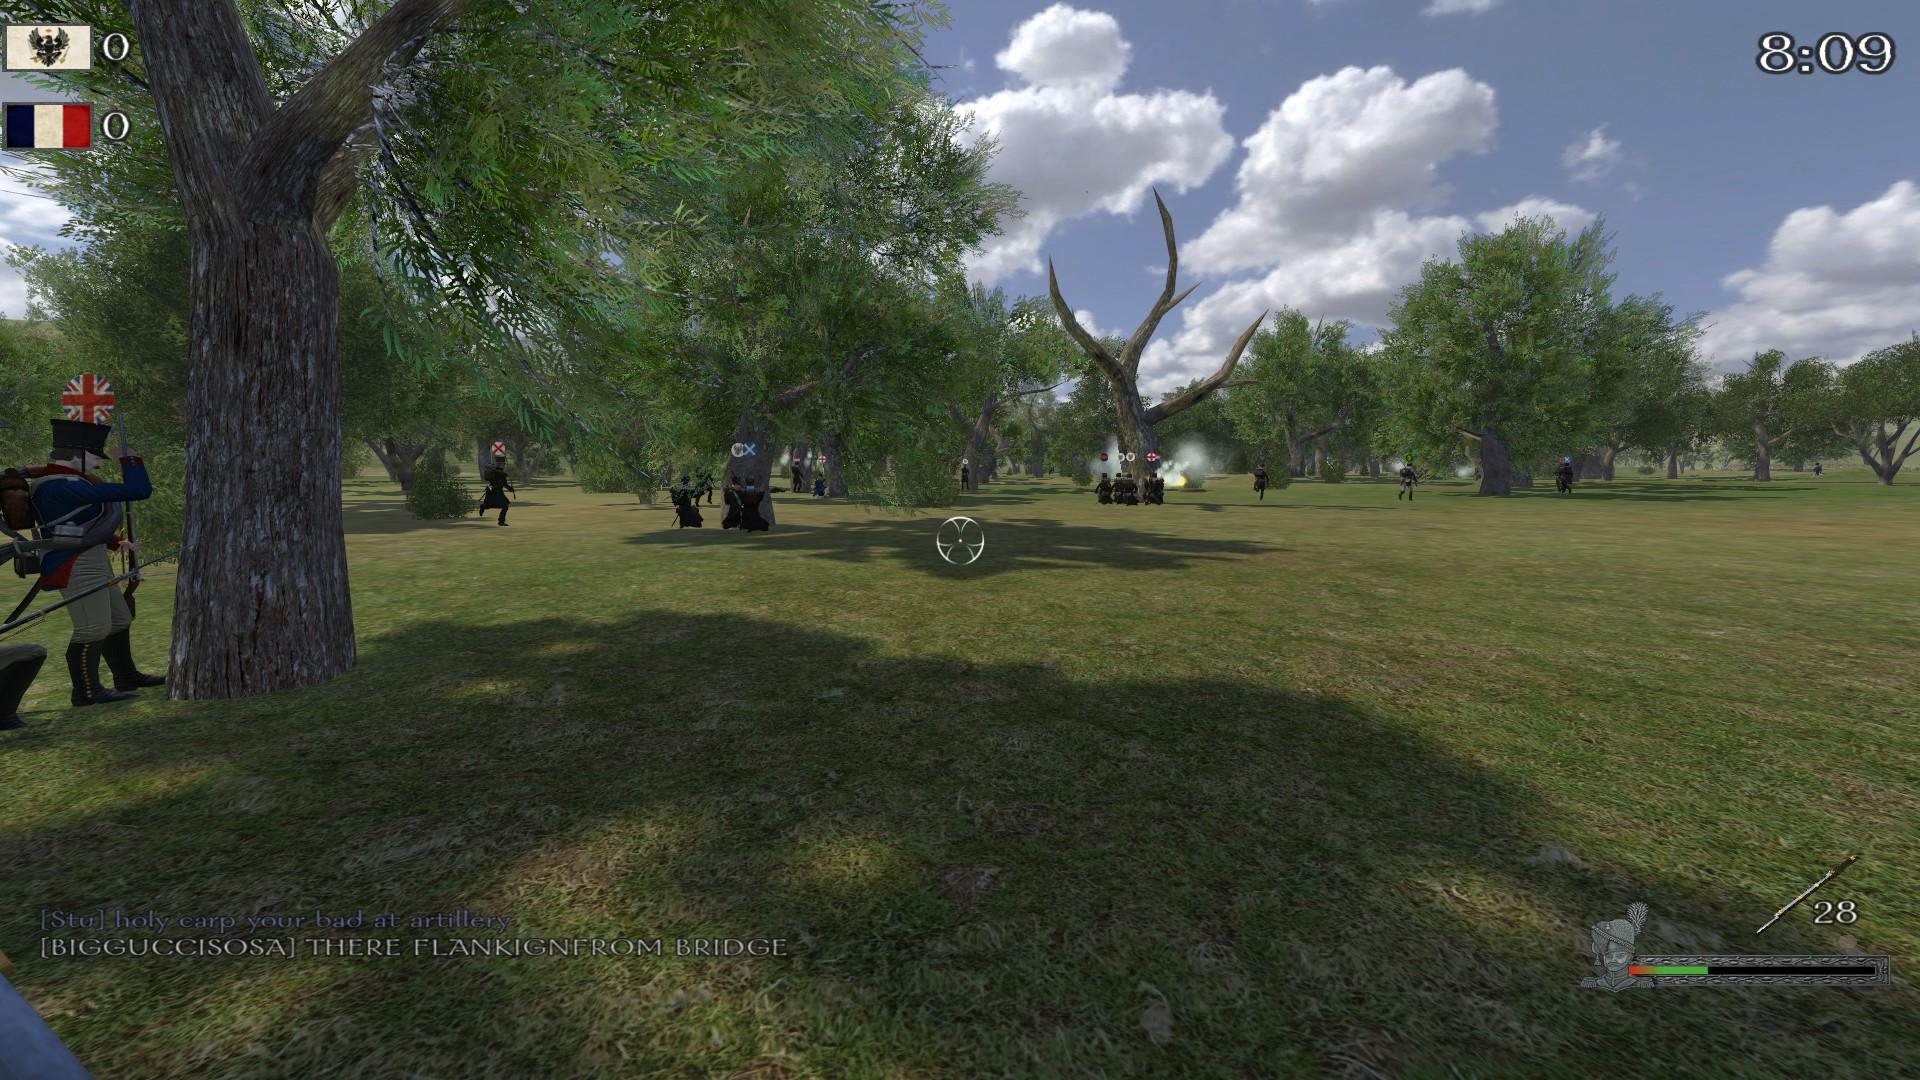 Mount & Blade Warband – Napoleonic Wars - Kampf in einem Wald